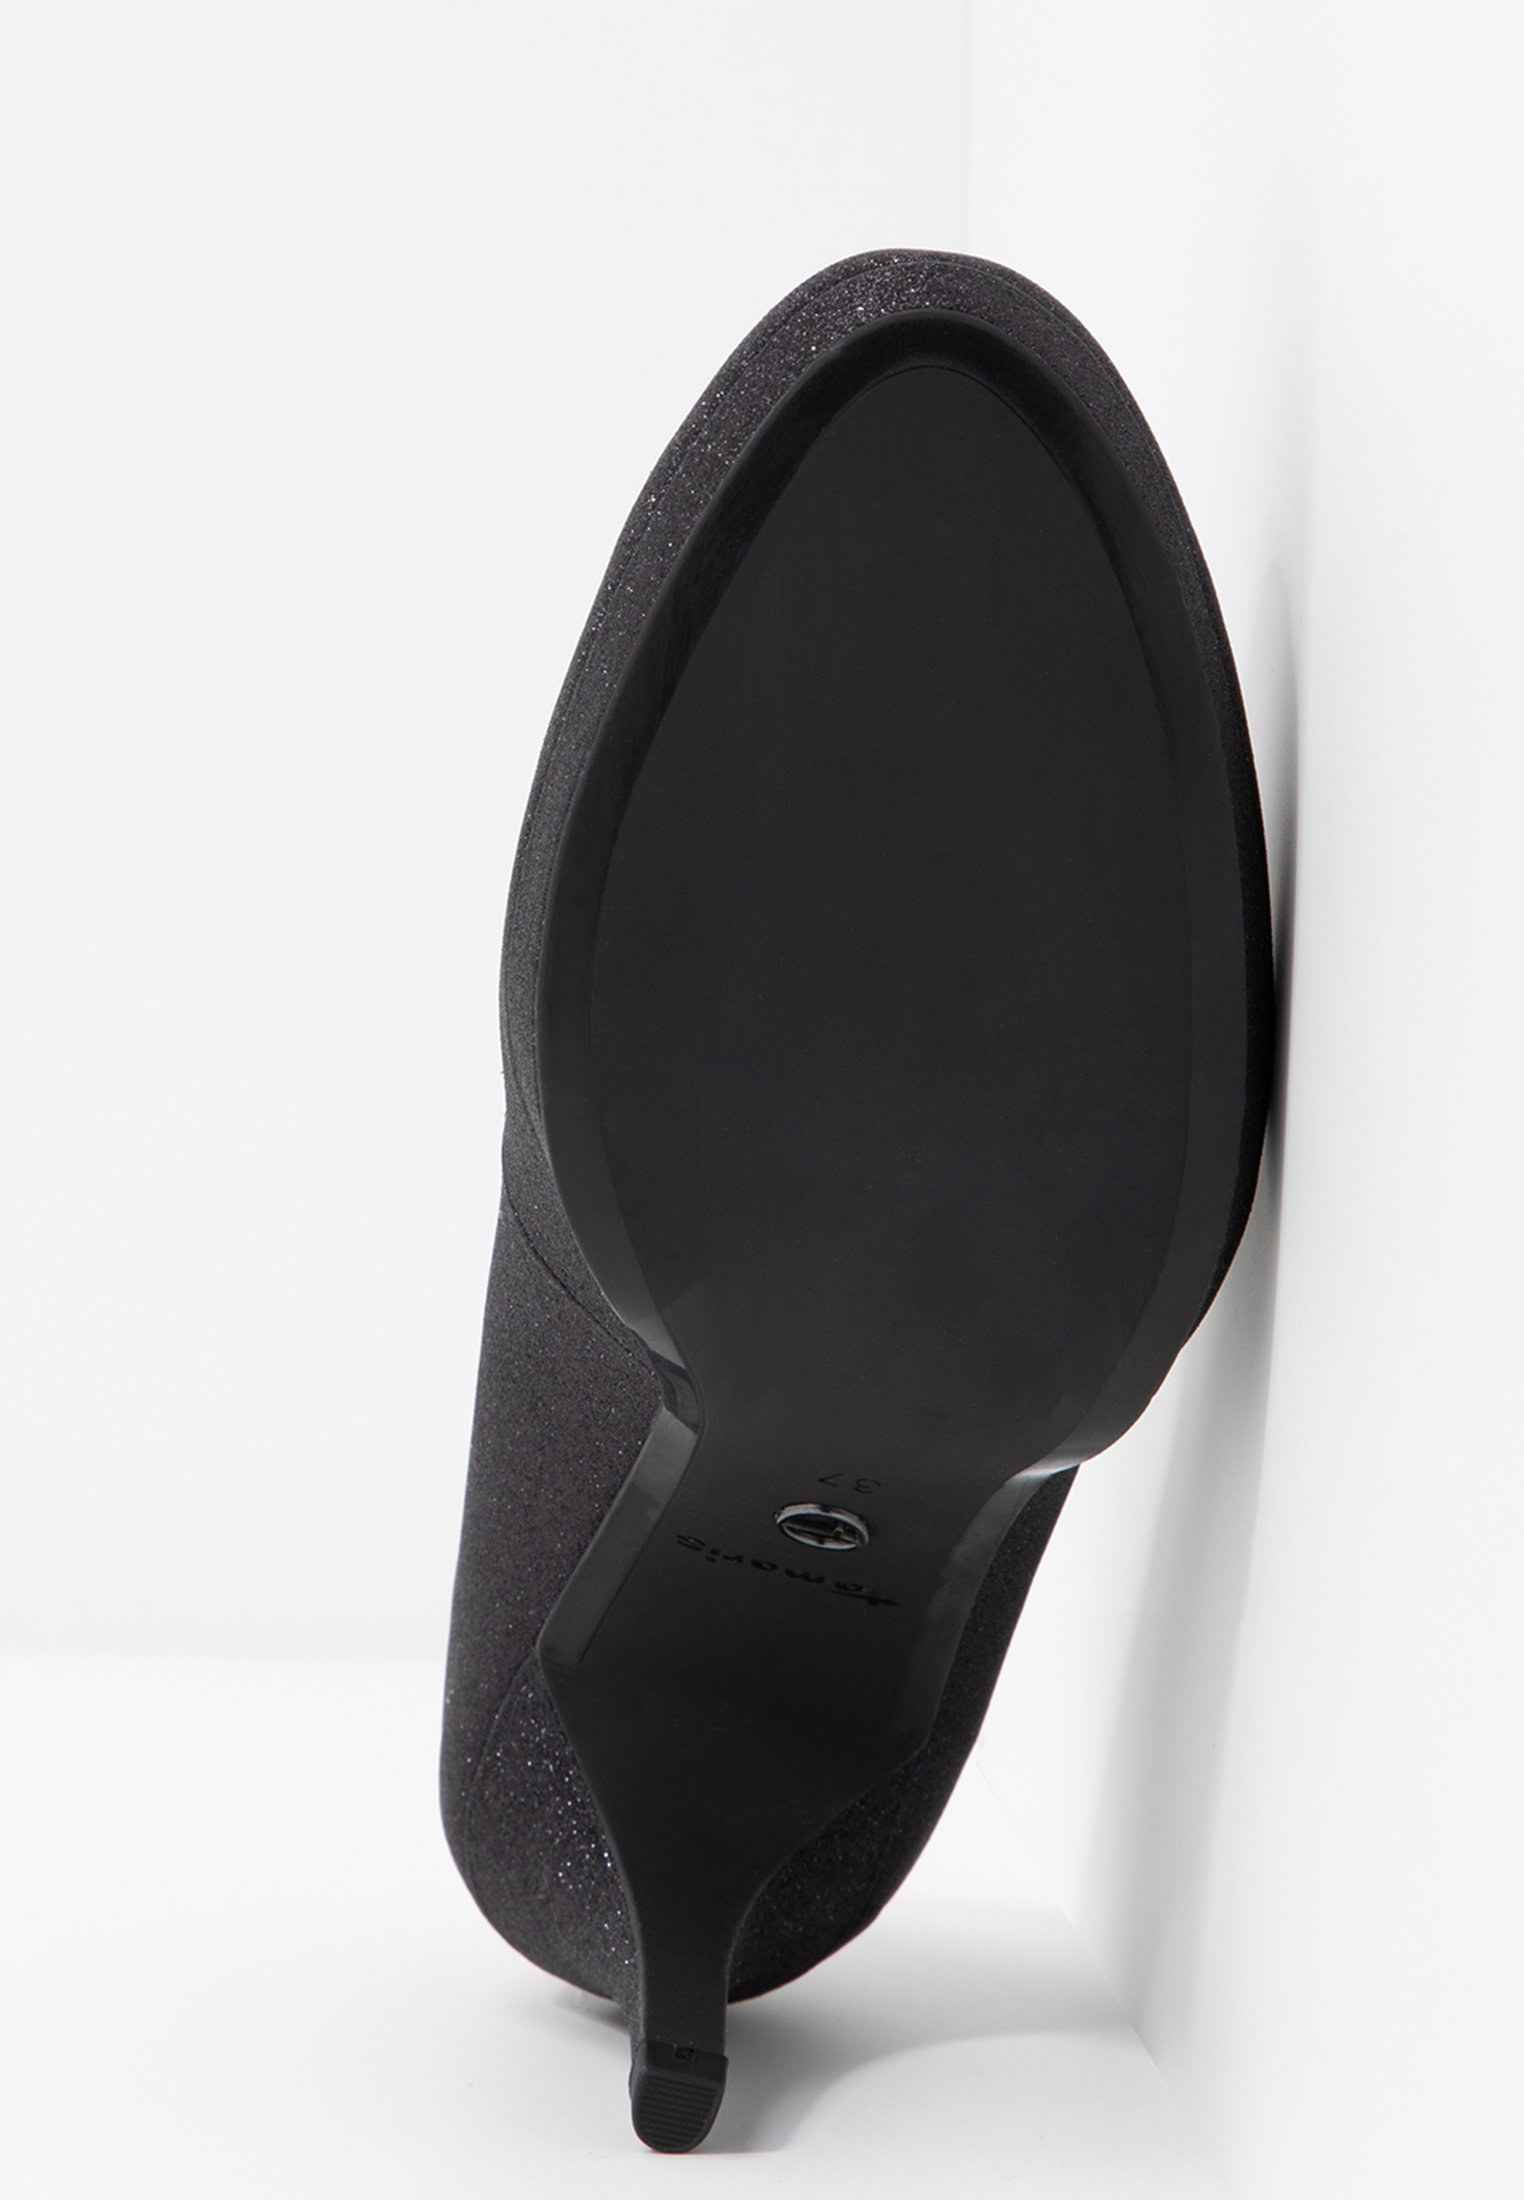 Tamaris Pumps - Black Glam